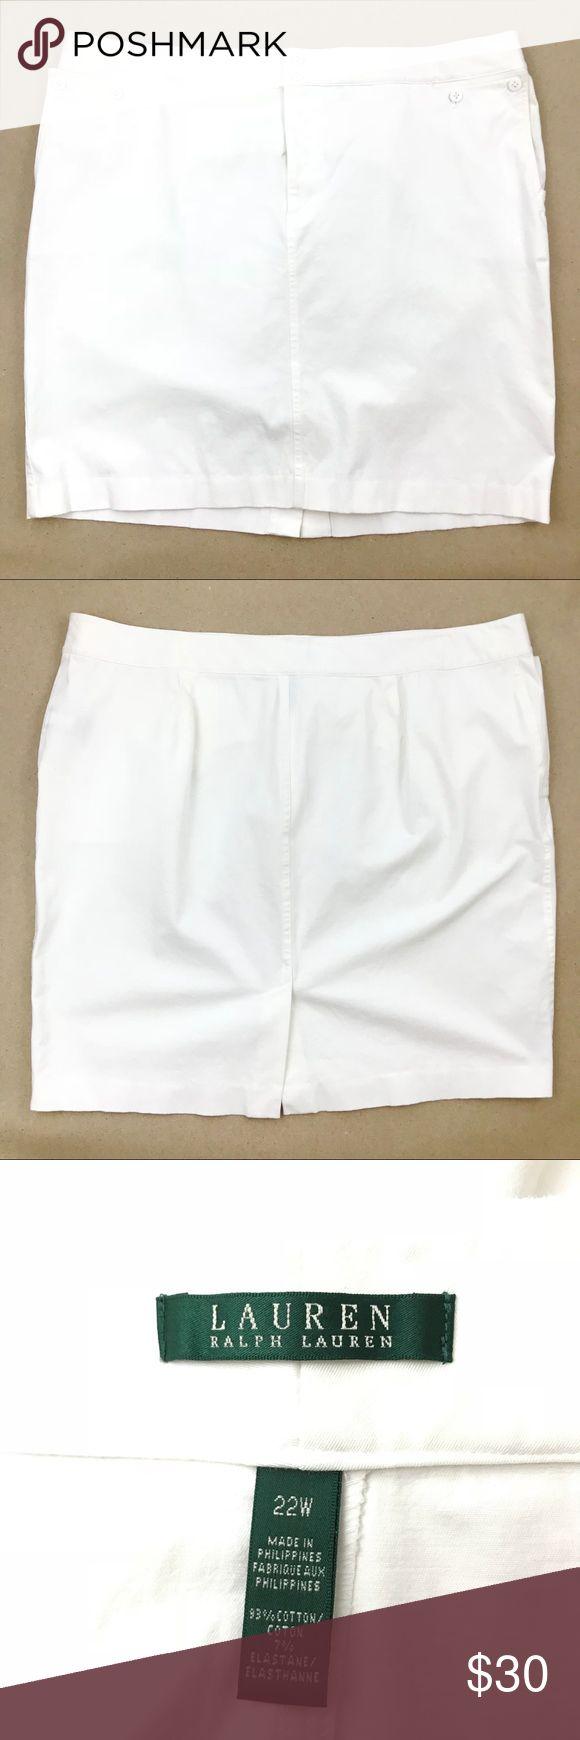 Plus Size Mini Skirt 22W White Lauren Ralph Knee Cotton Straight Cut Pencil Fitted Pockets Zipper Button Solid Color Stretch Stretchy Lauren Ralph Lauren Skirts Mini